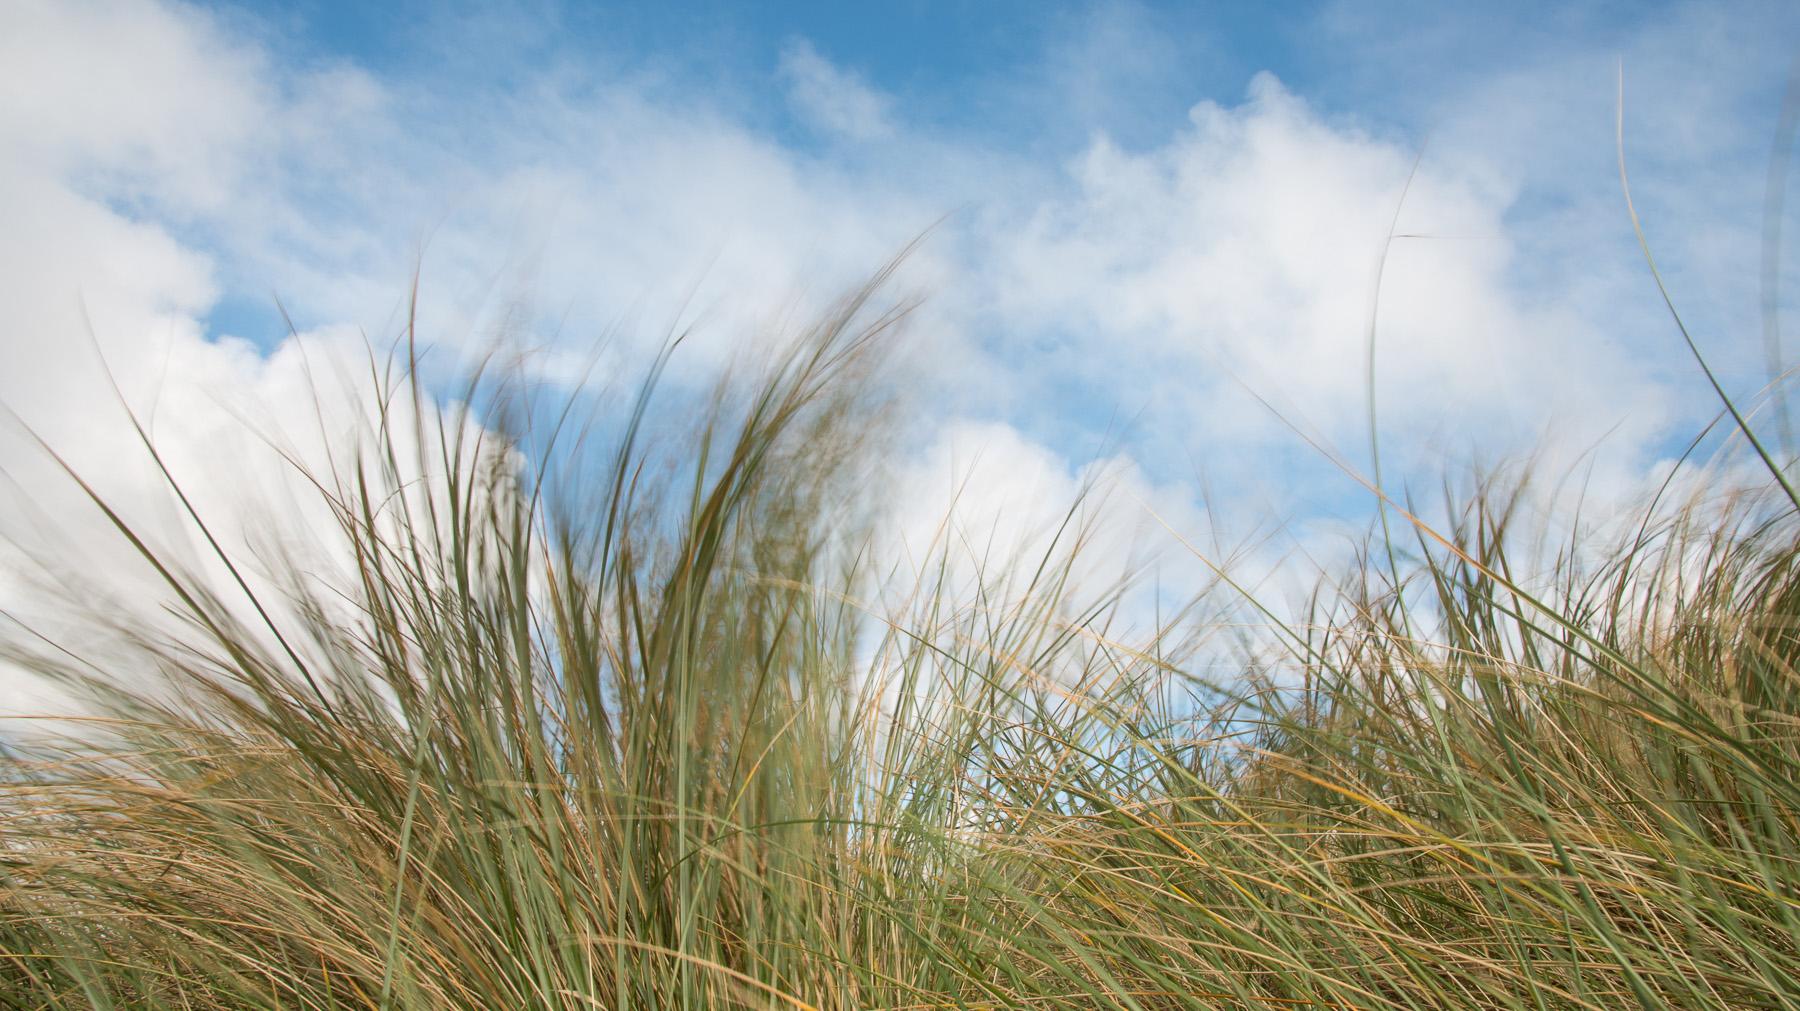 Dünengras im Wind